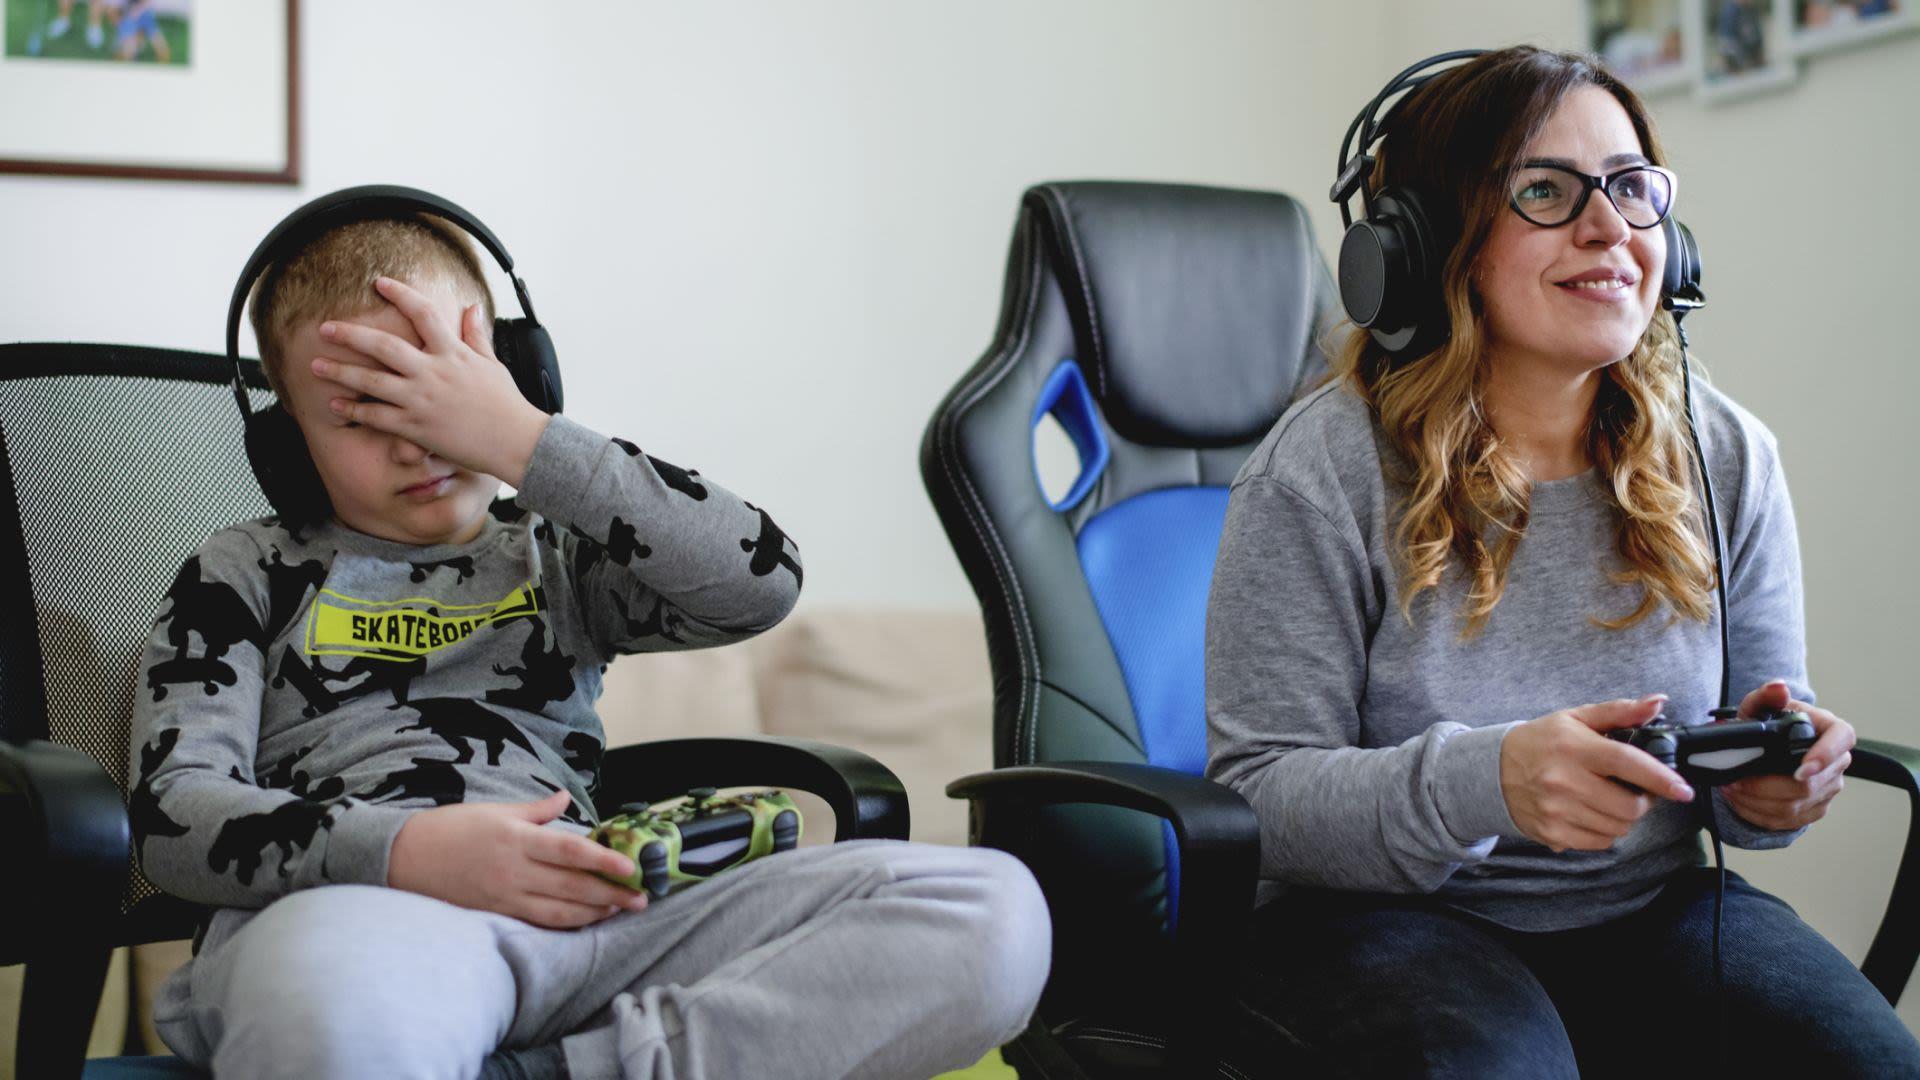 Geschwister, Junge, Mädchen, Gaming-Stuhl, Gaming, PlayStation 4, PS4 Urheber: Getty/dmphoto, 1219438427